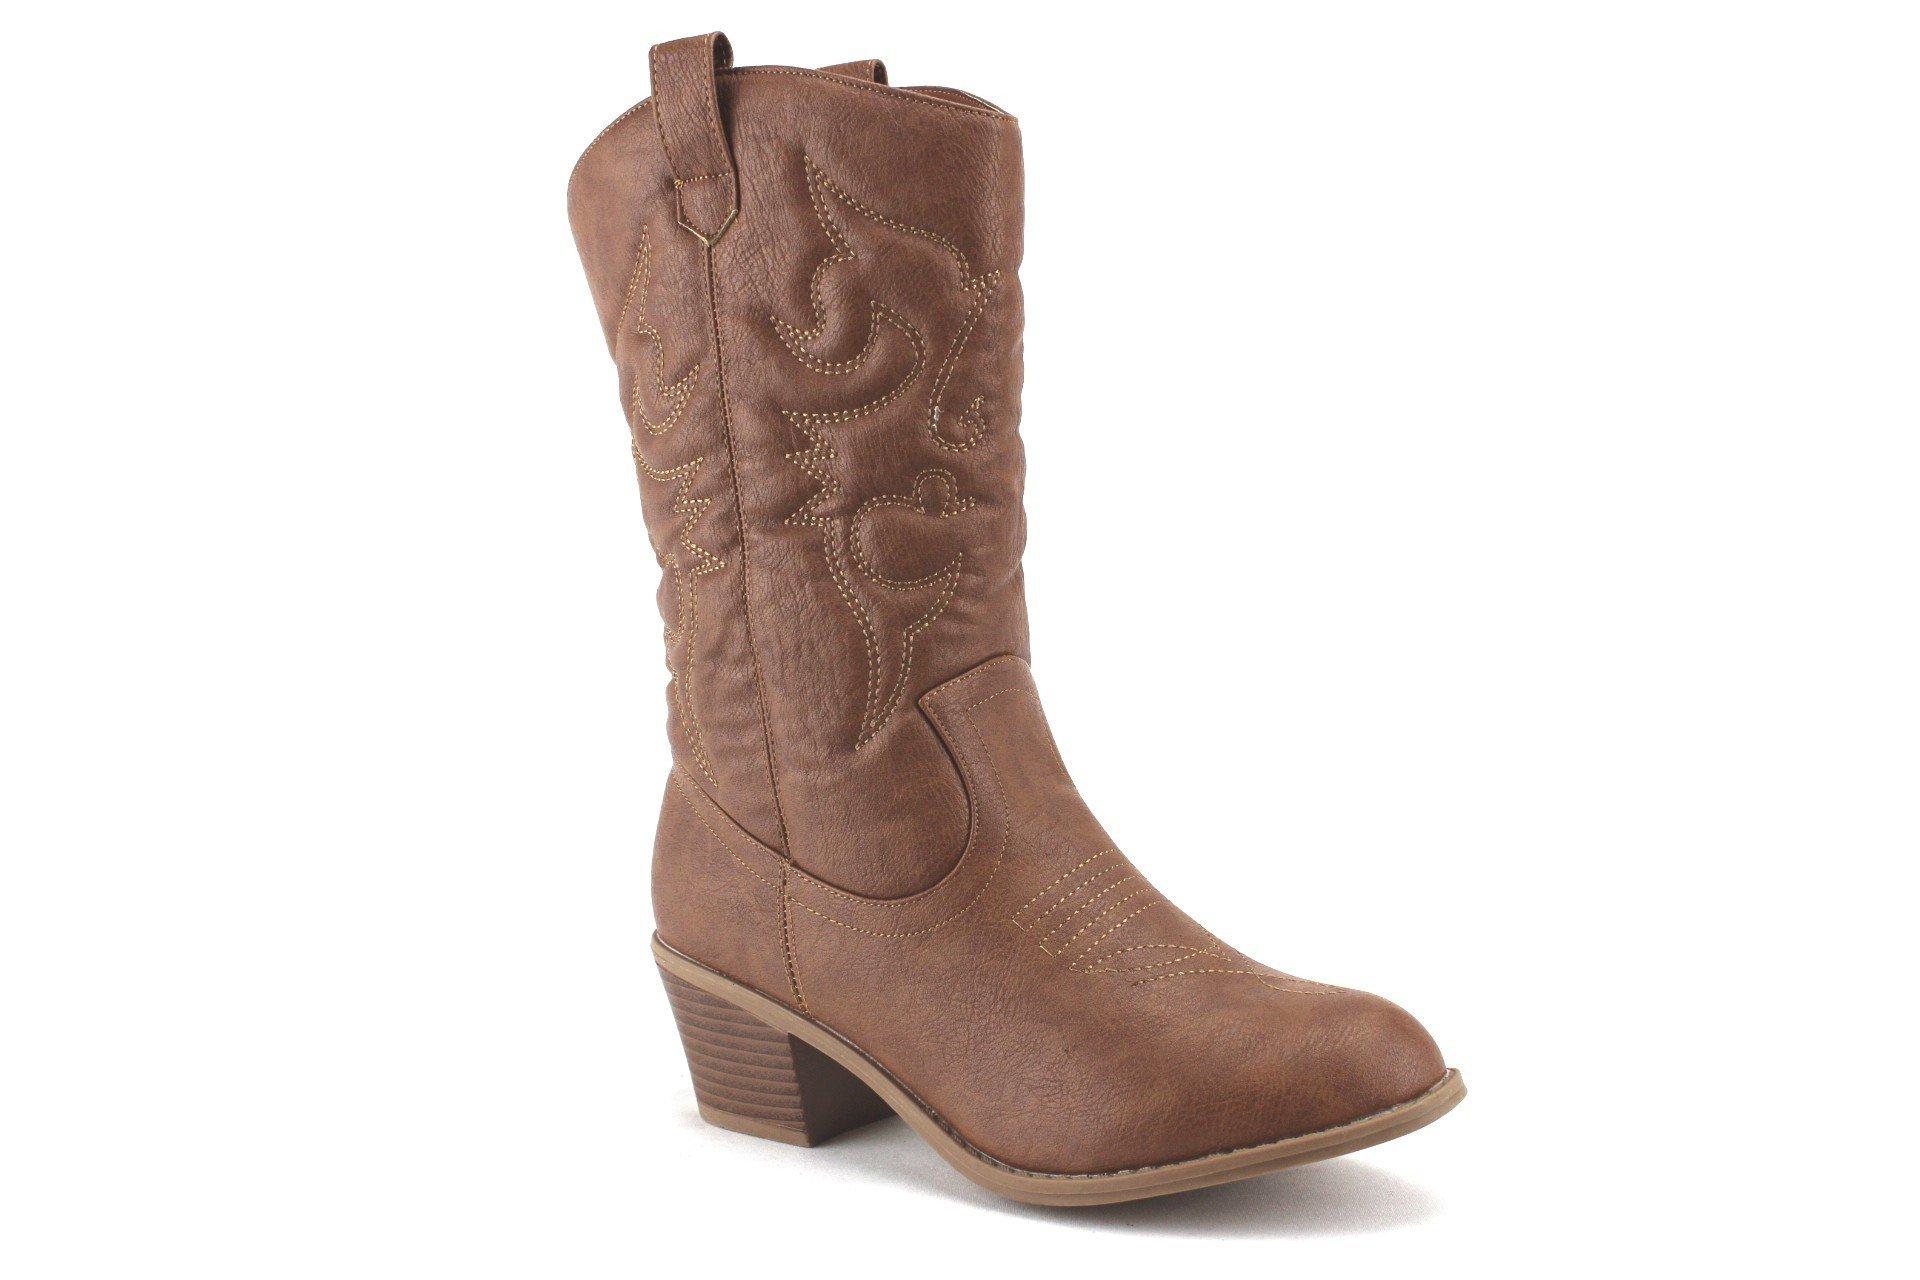 J'aime Aldo Women's TEX-25 Tall Stitched Western Cowboy Cowgirl Boots, Tan, 6.5